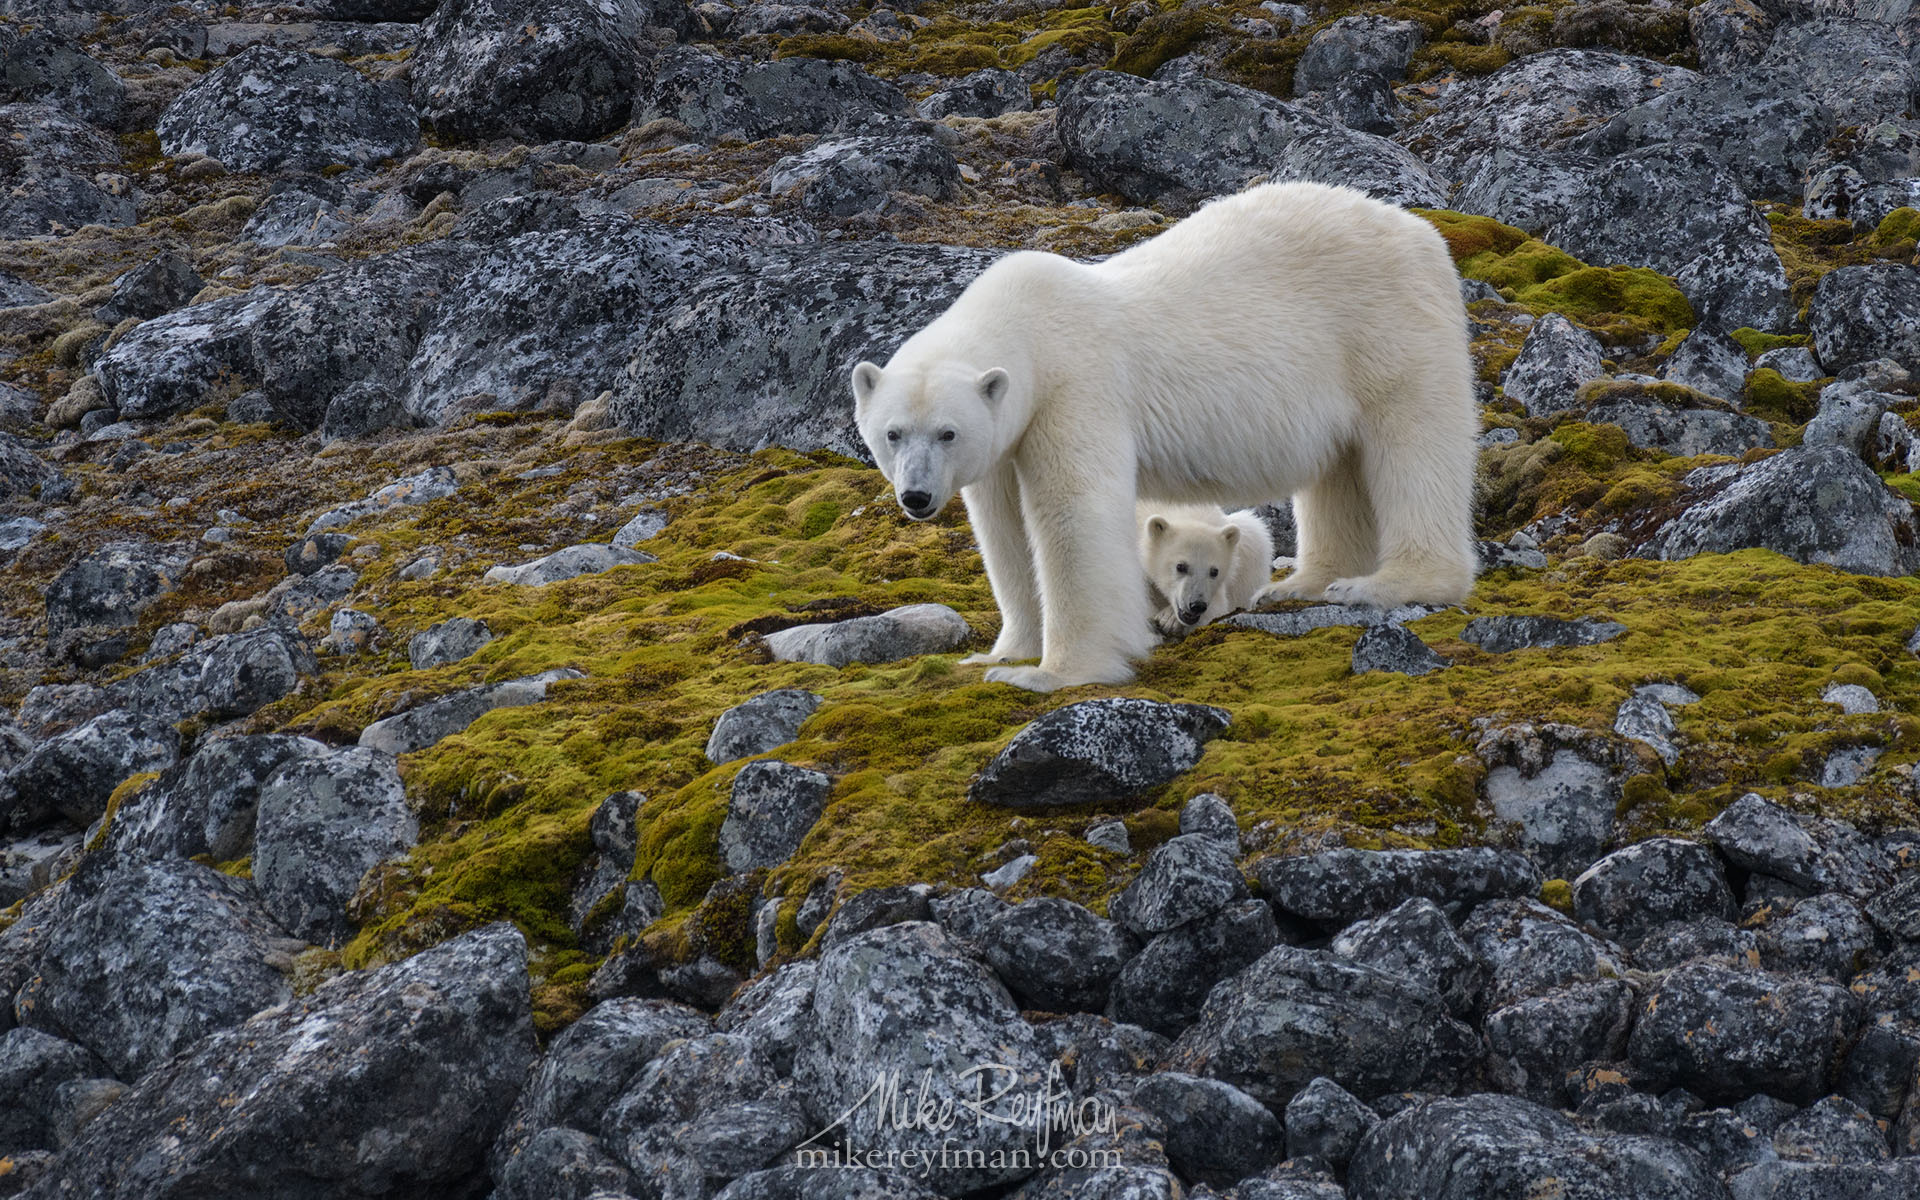 polarbears, nature, explorerverything, world, bears,  nature, photography, gothere,  ecotravel, ecotourism, animals, vacation,  arctic, svalbard, wildlife, marinelife, nature,  closeup, animals, Майк Рейфман